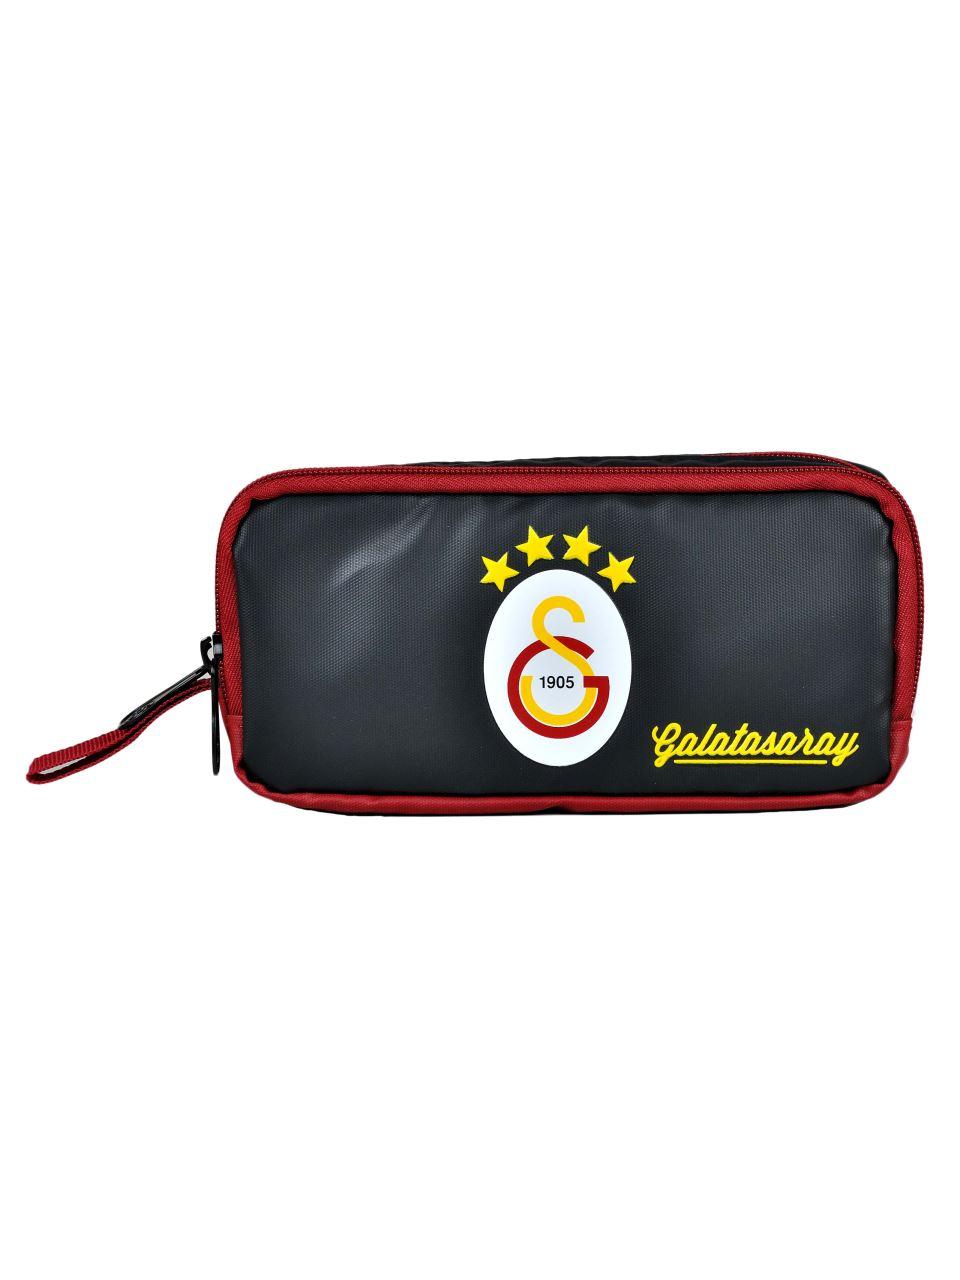 U13004 Galatasaray Kalem Çantası 95441